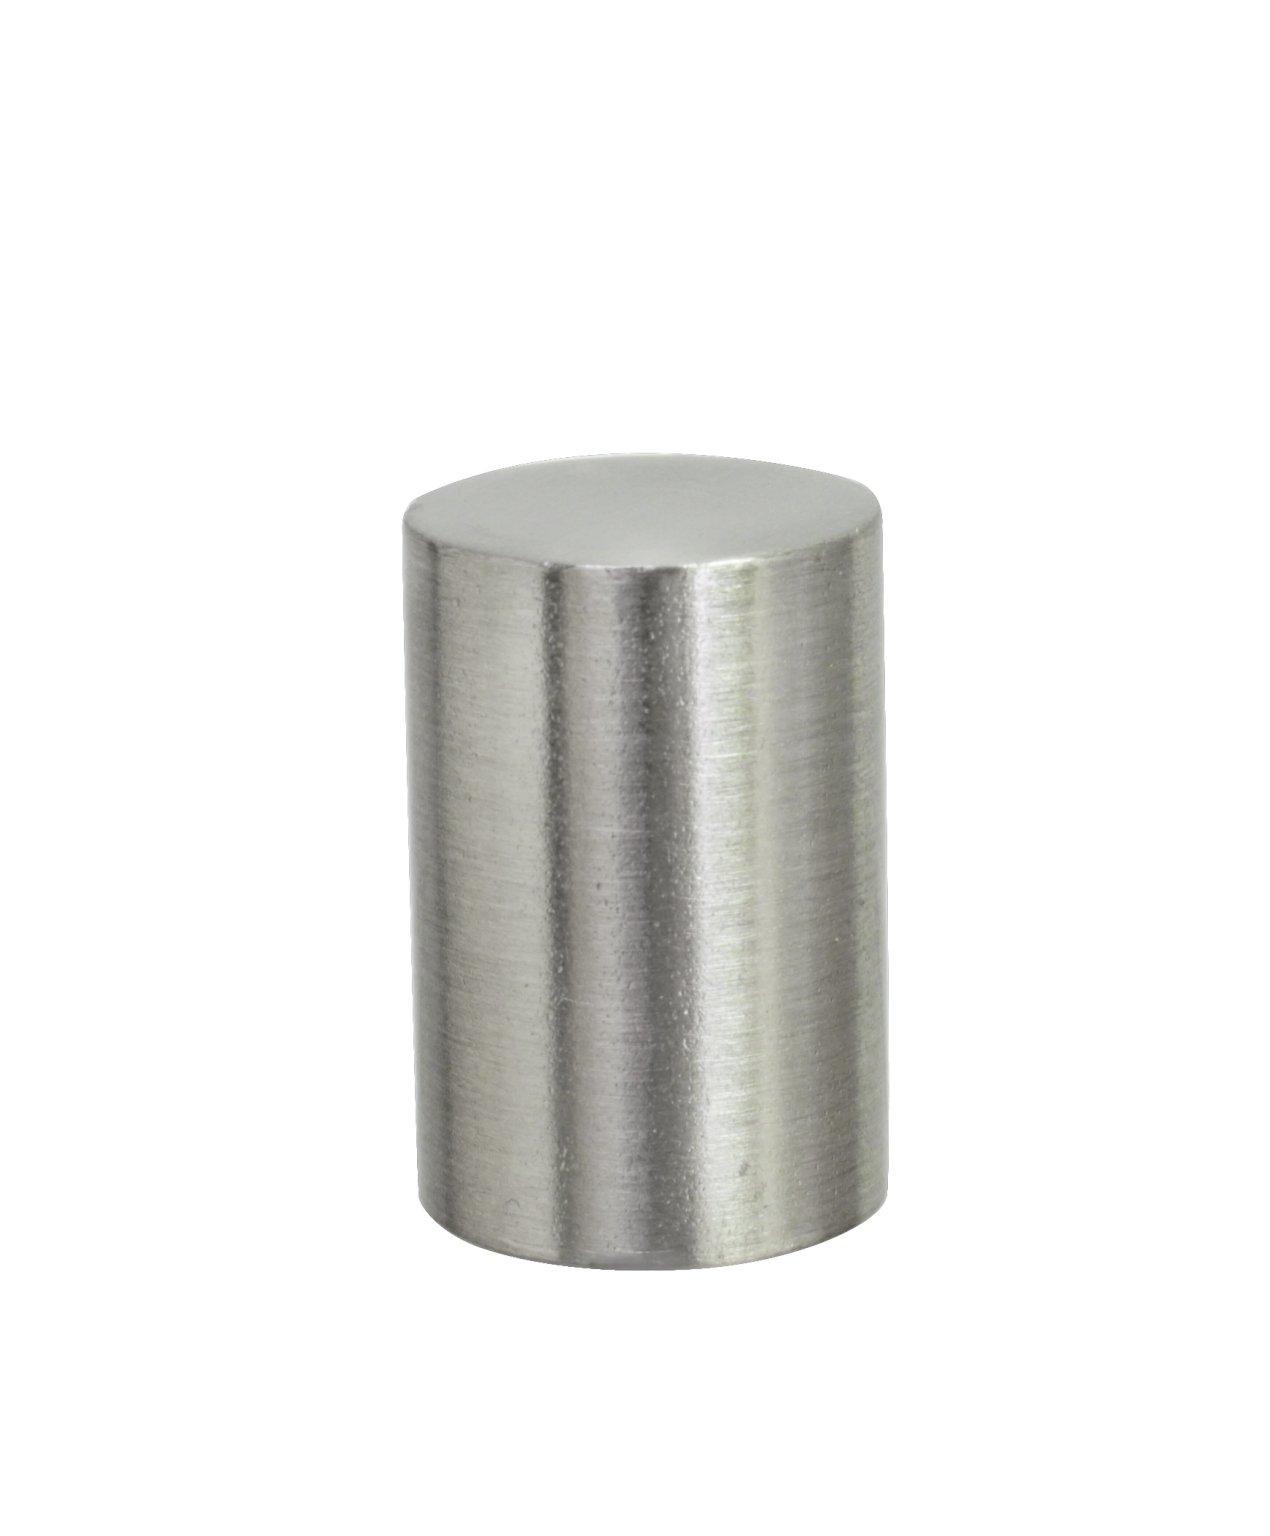 Aspen Creative 24019-21 Steel Lamp Finial Finish, 1 1/4'' Tall (1), 1 PACK, Brushed Nickel